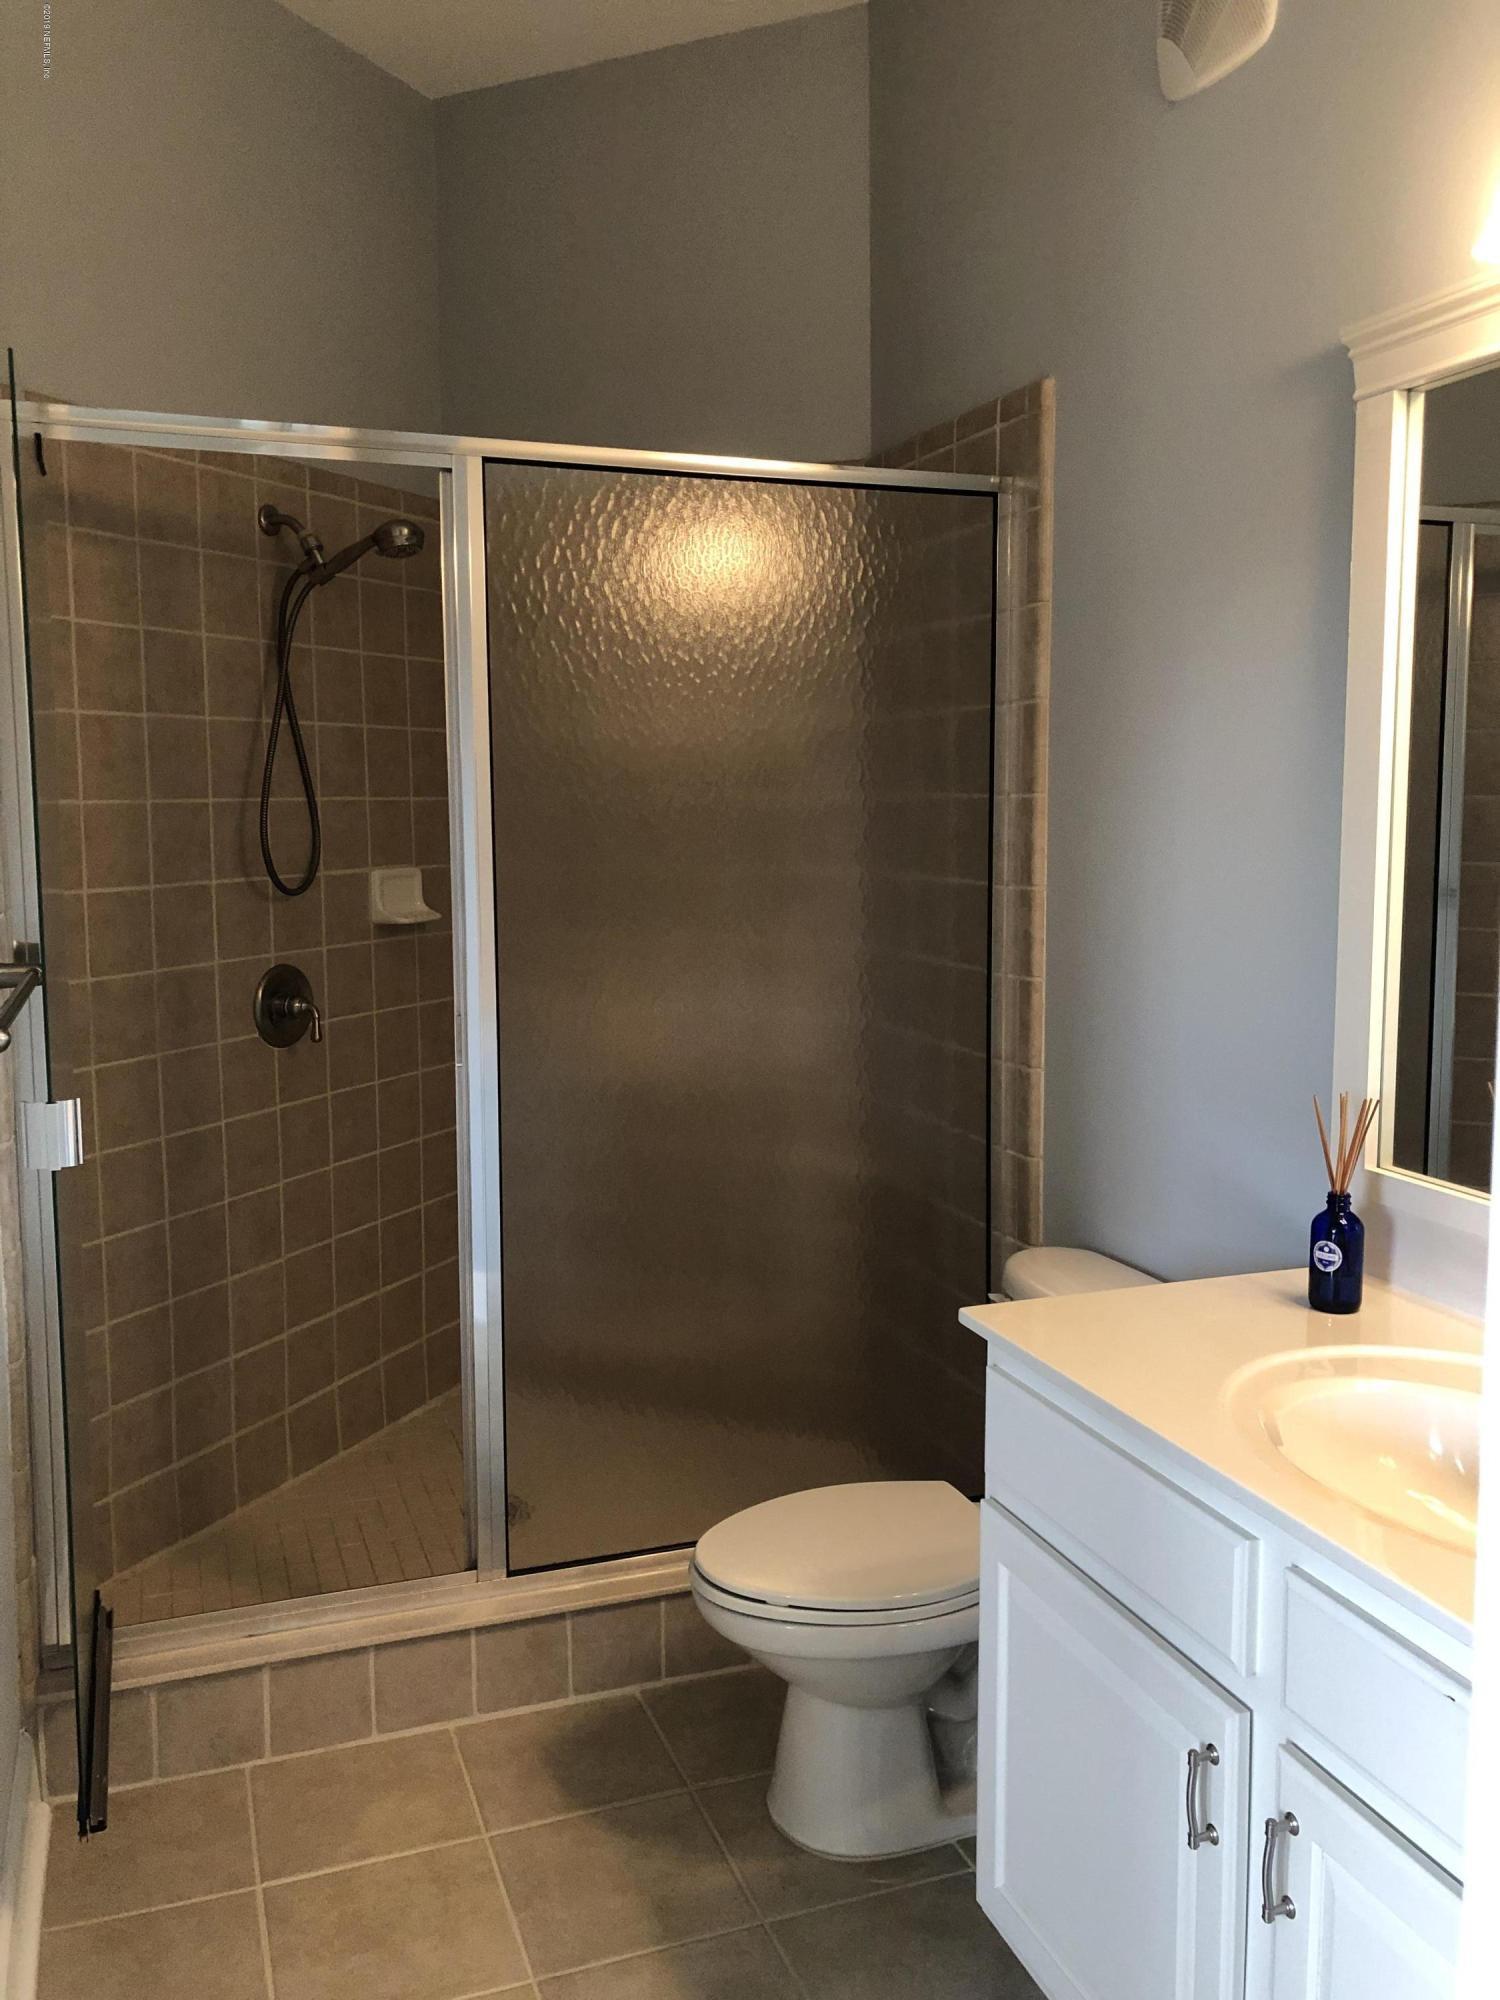 2035 SECRET GARDEN, ORANGE PARK, FLORIDA 32003, 3 Bedrooms Bedrooms, ,3 BathroomsBathrooms,Rental,For Rent,SECRET GARDEN,1019108